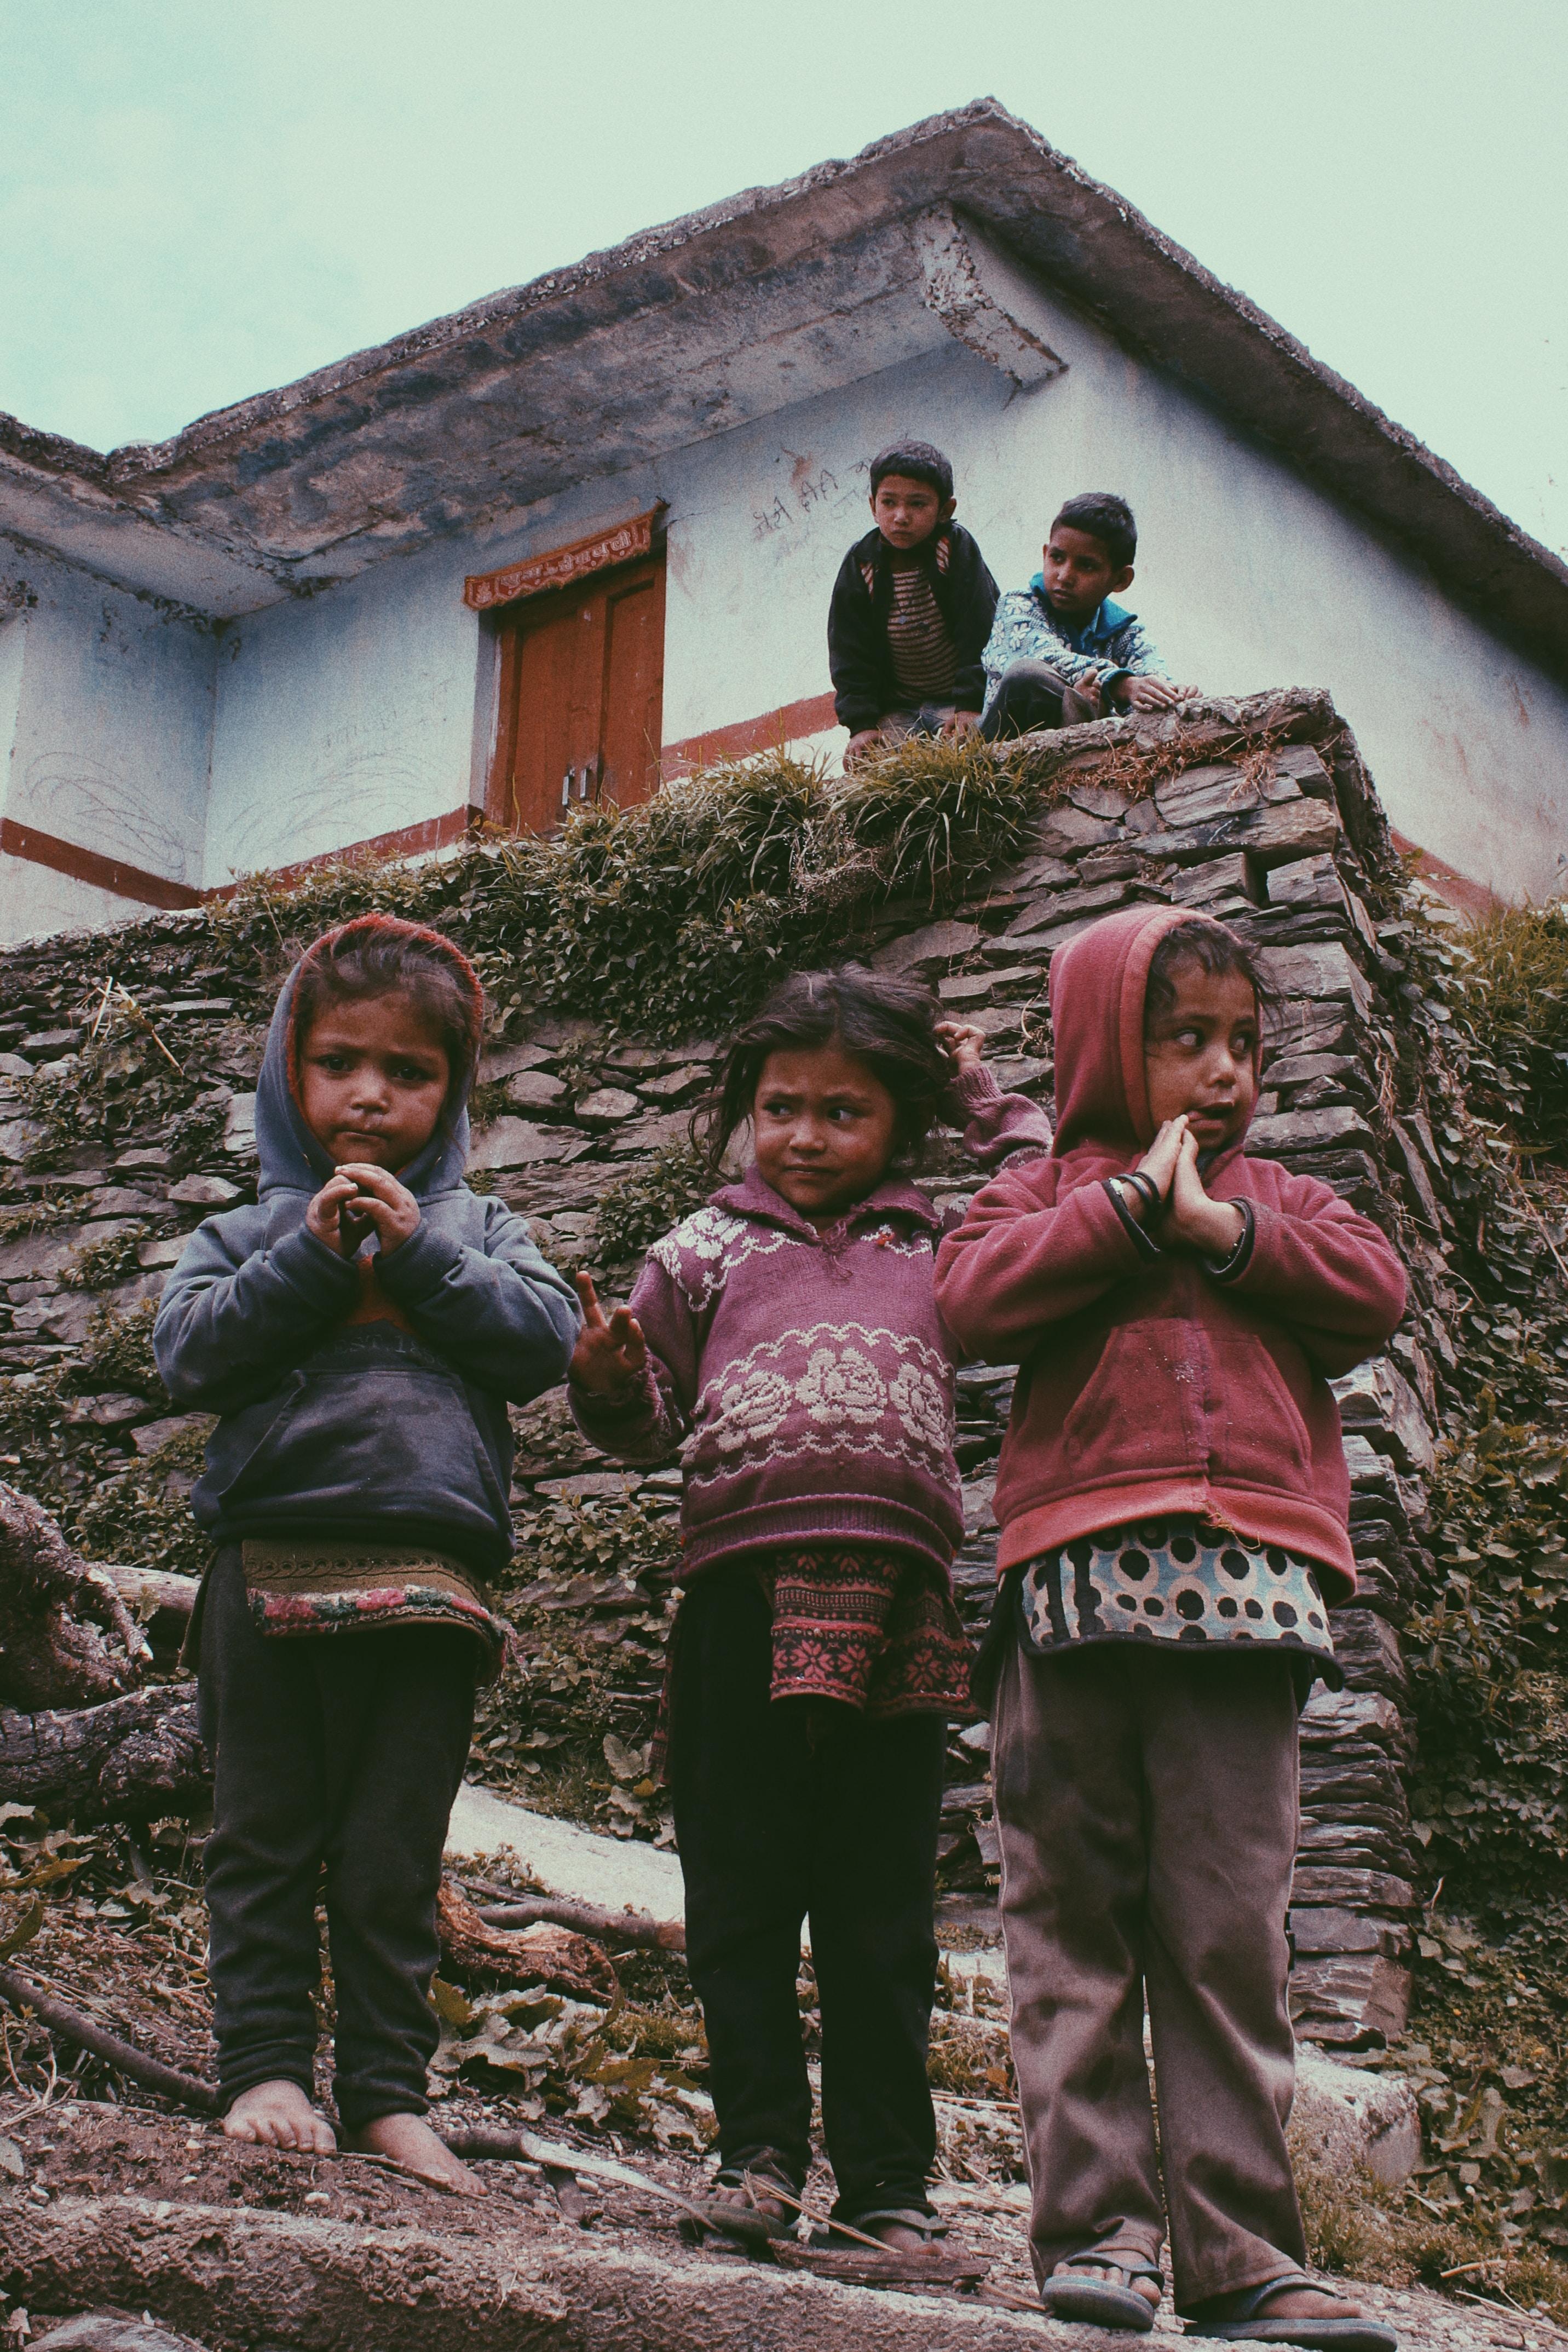 group of children standing near house